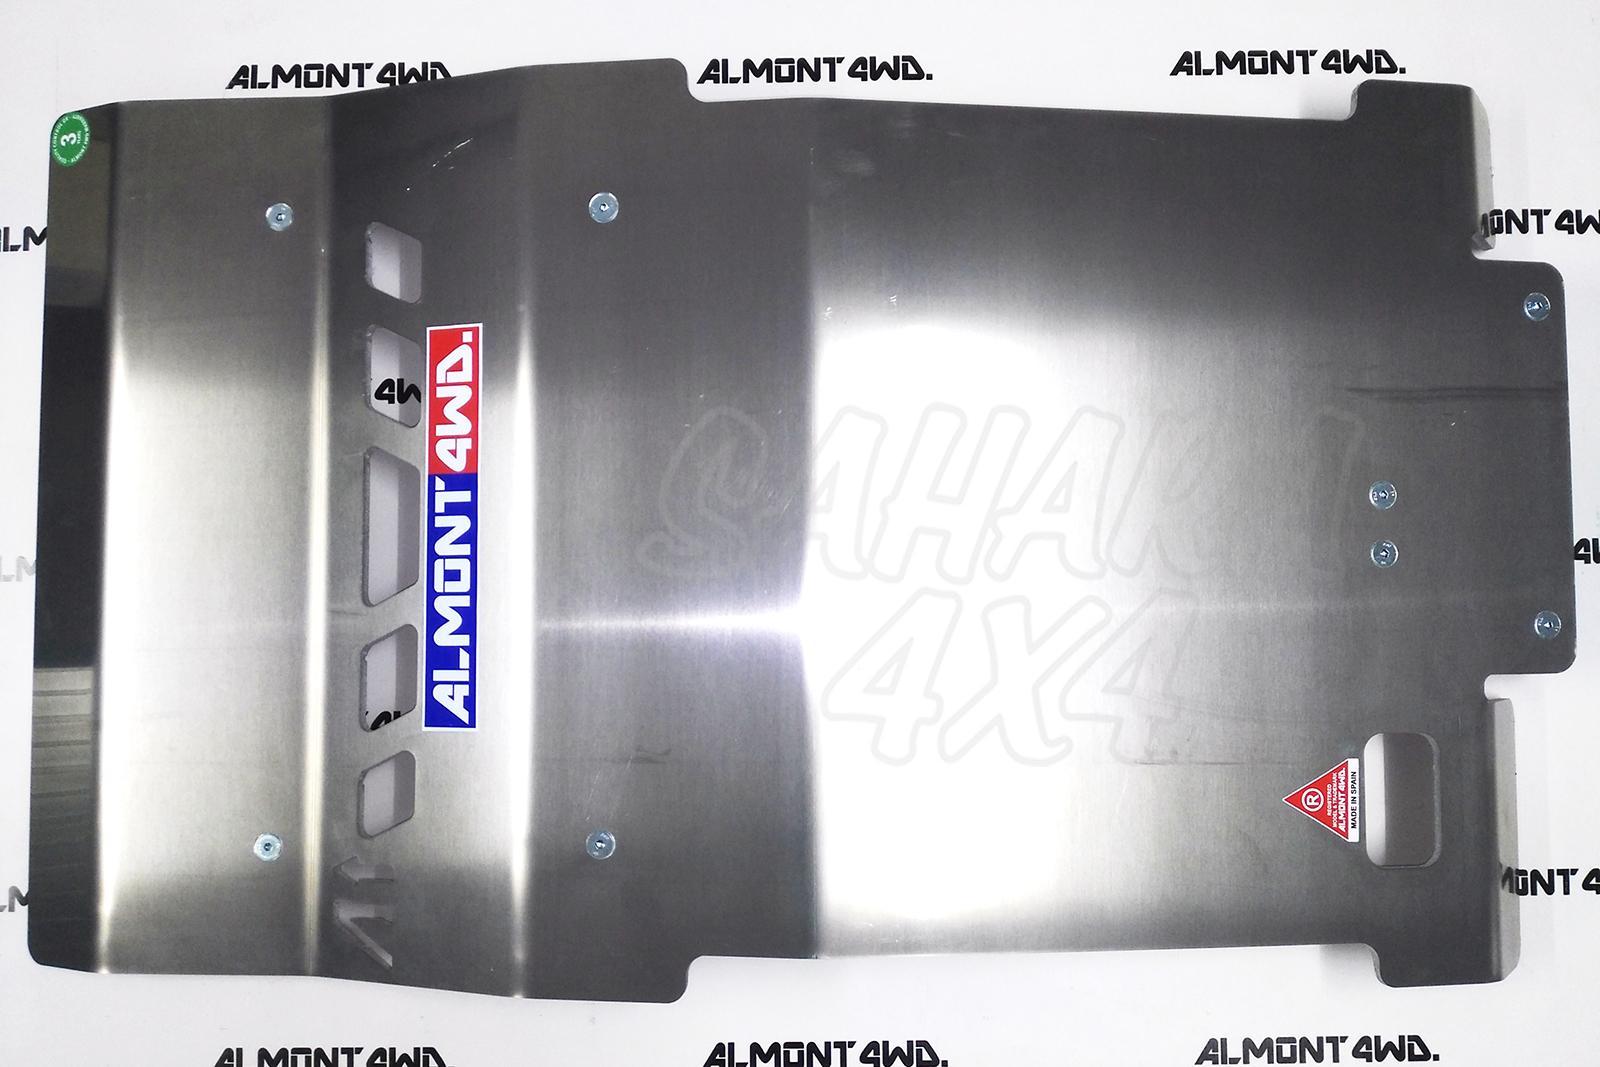 Almont 4wd Skid Plates For Mitsubishi L200 Warrior Fuse Box